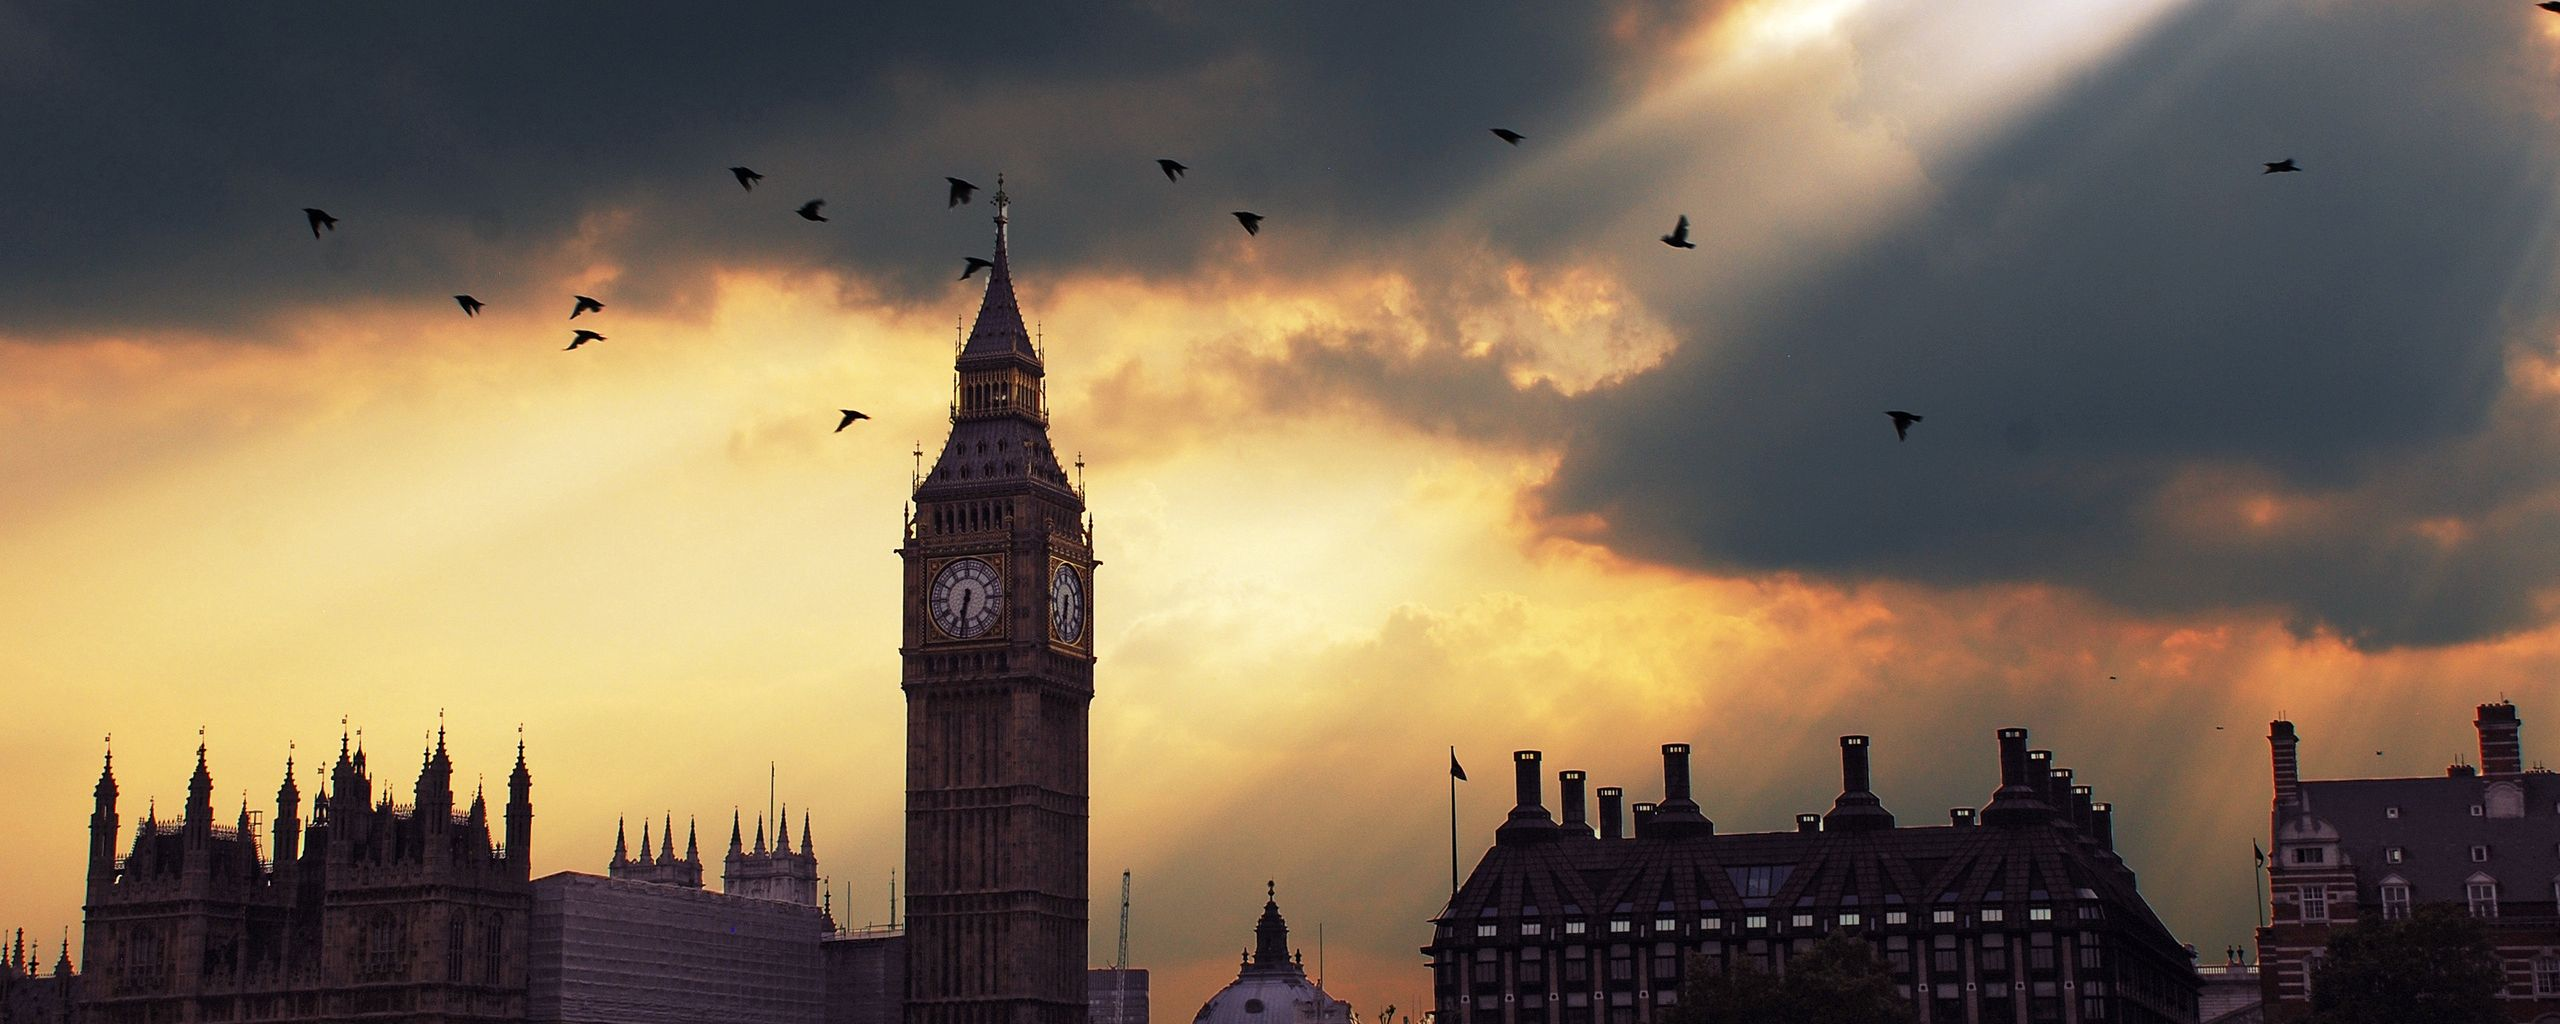 2560x1024 Wallpaper london, big ben, sunset, shadow, sky